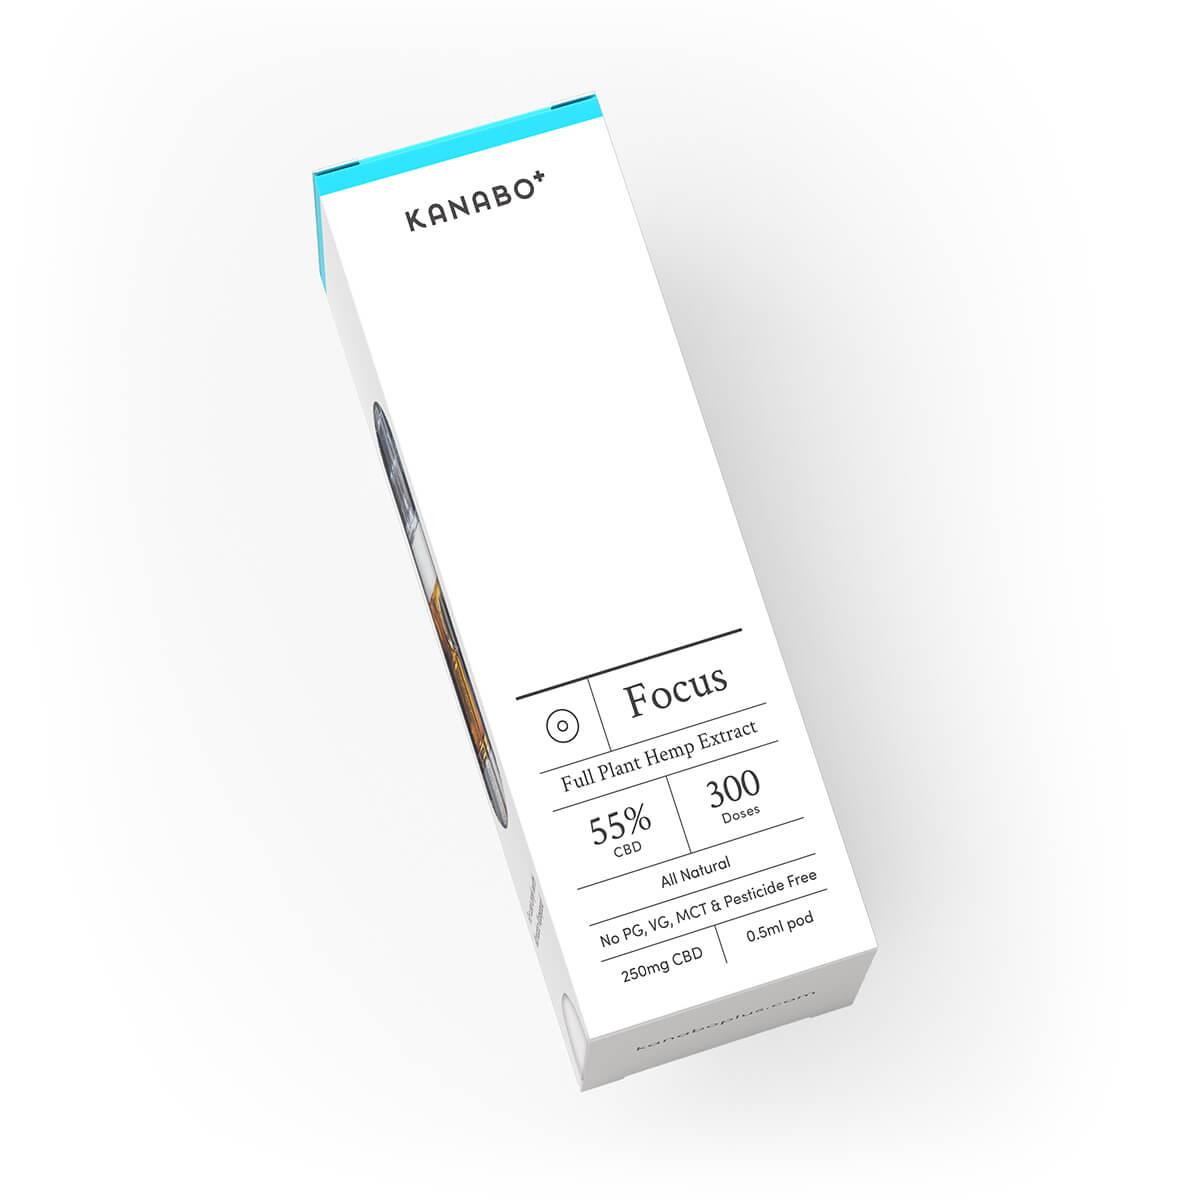 Kanabo Focus 55% CBD 0.5ml Pod Vapepod Compatible CCELL Tecnology